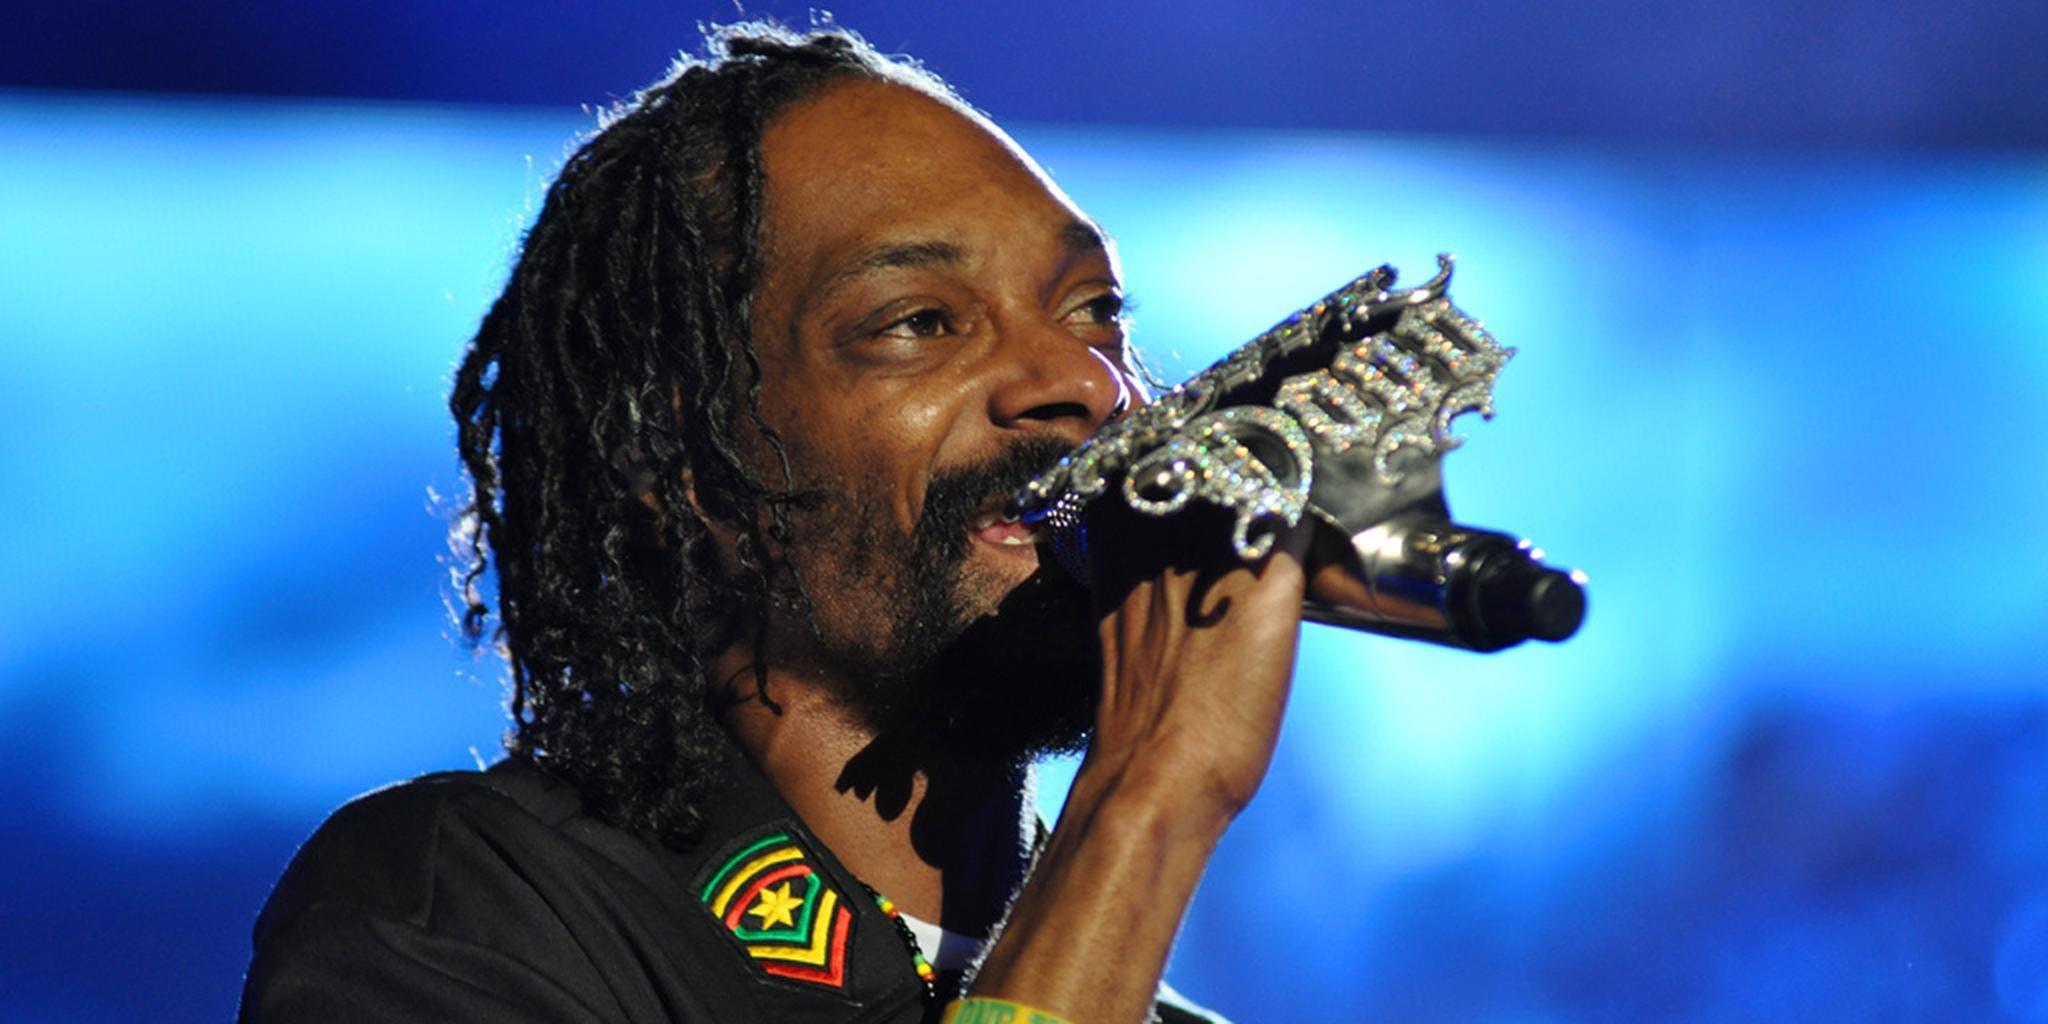 reddit celebs : Snoop Dogg